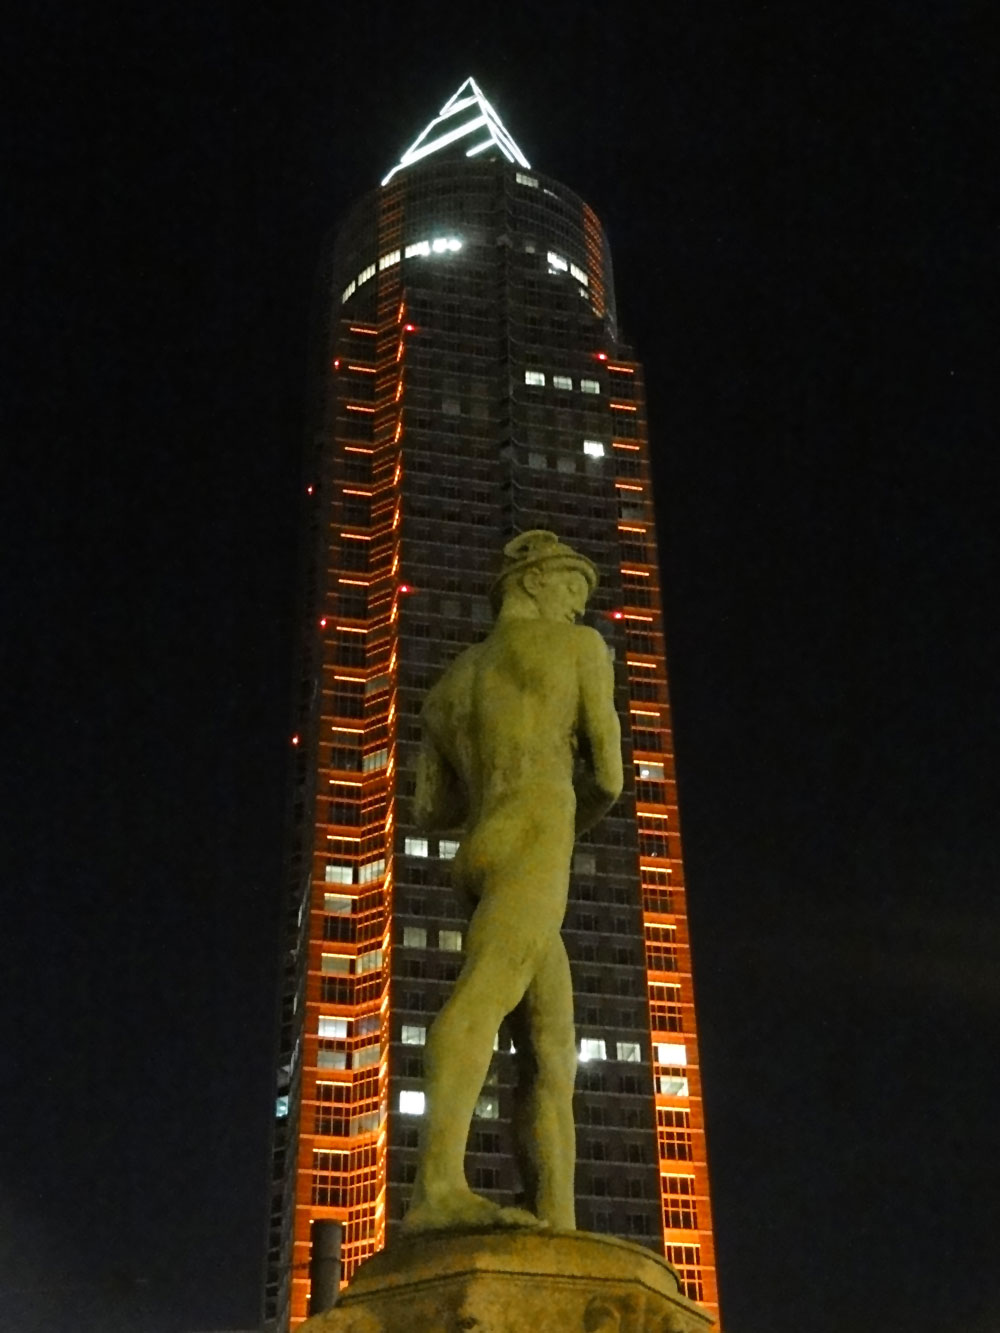 luminale-2016-frankfurt-illumination-messeturm-1